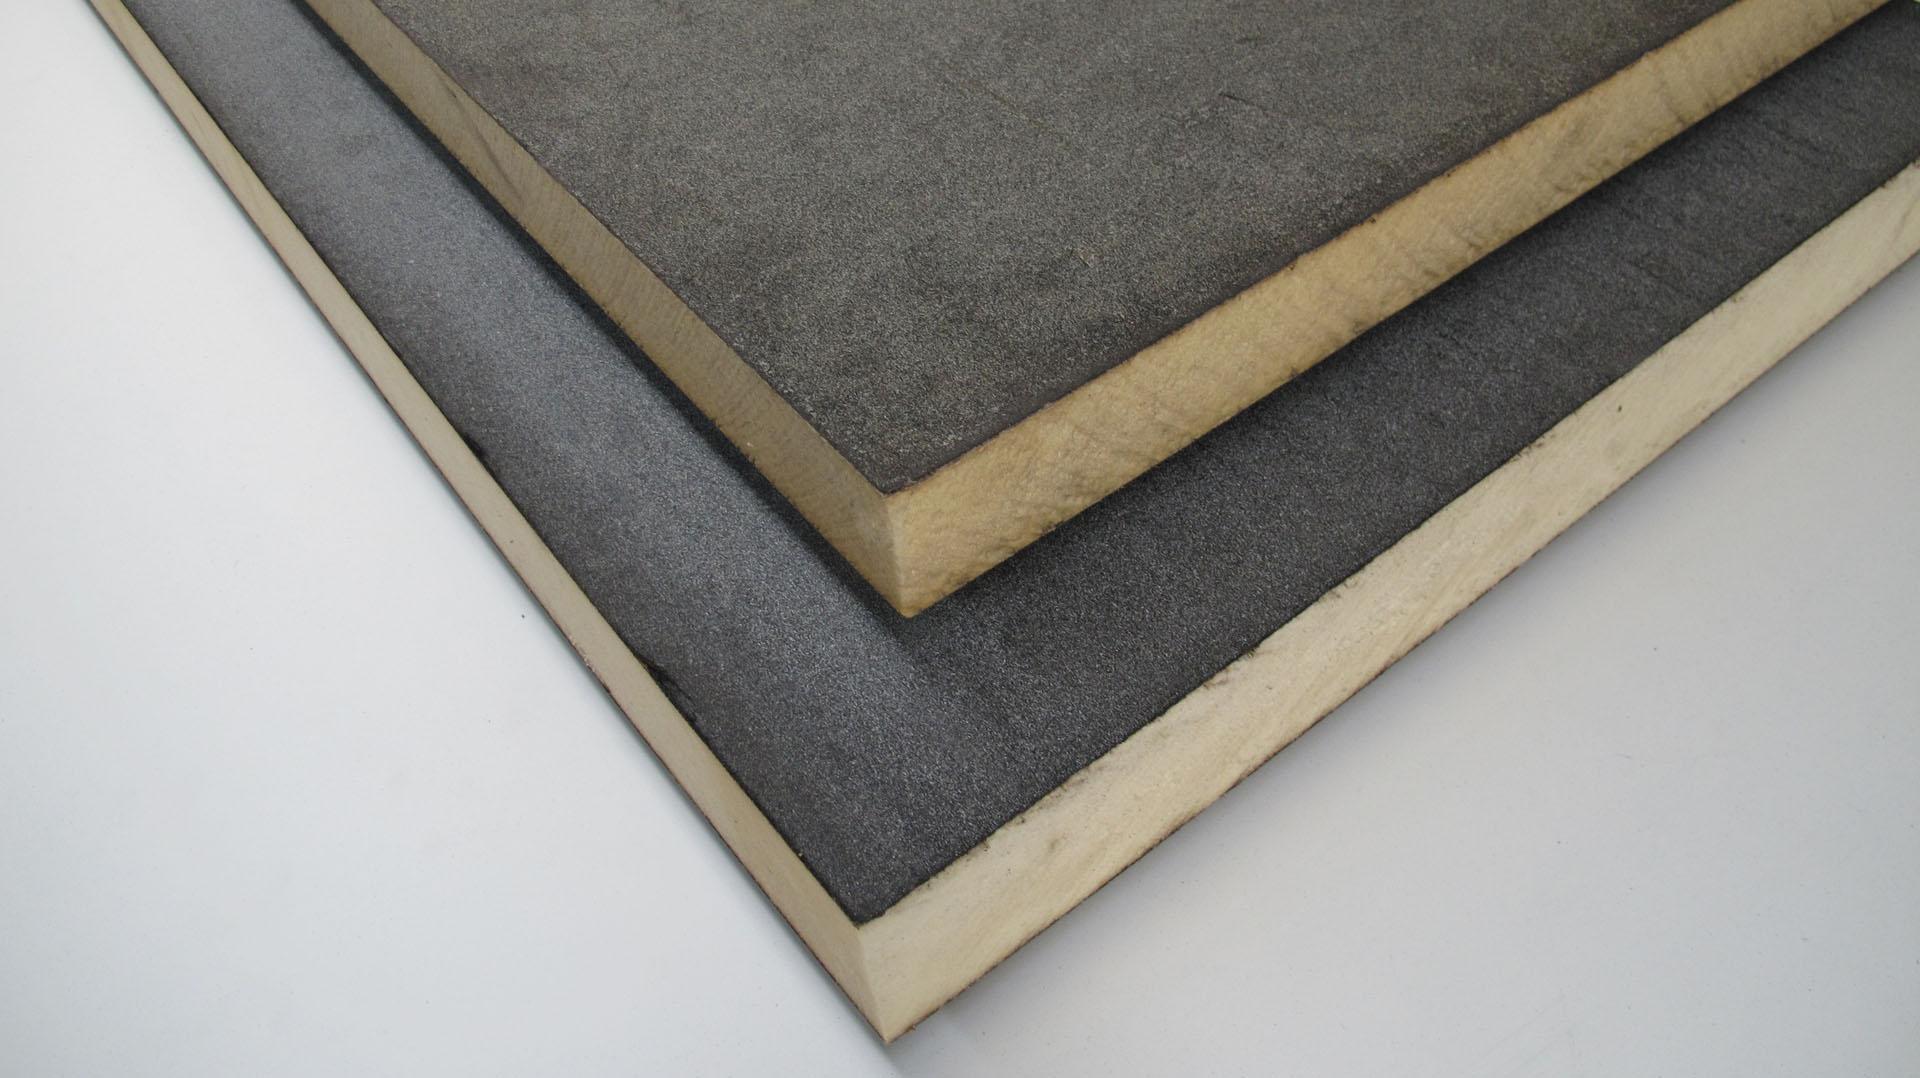 Isolatiematerialen A-keus